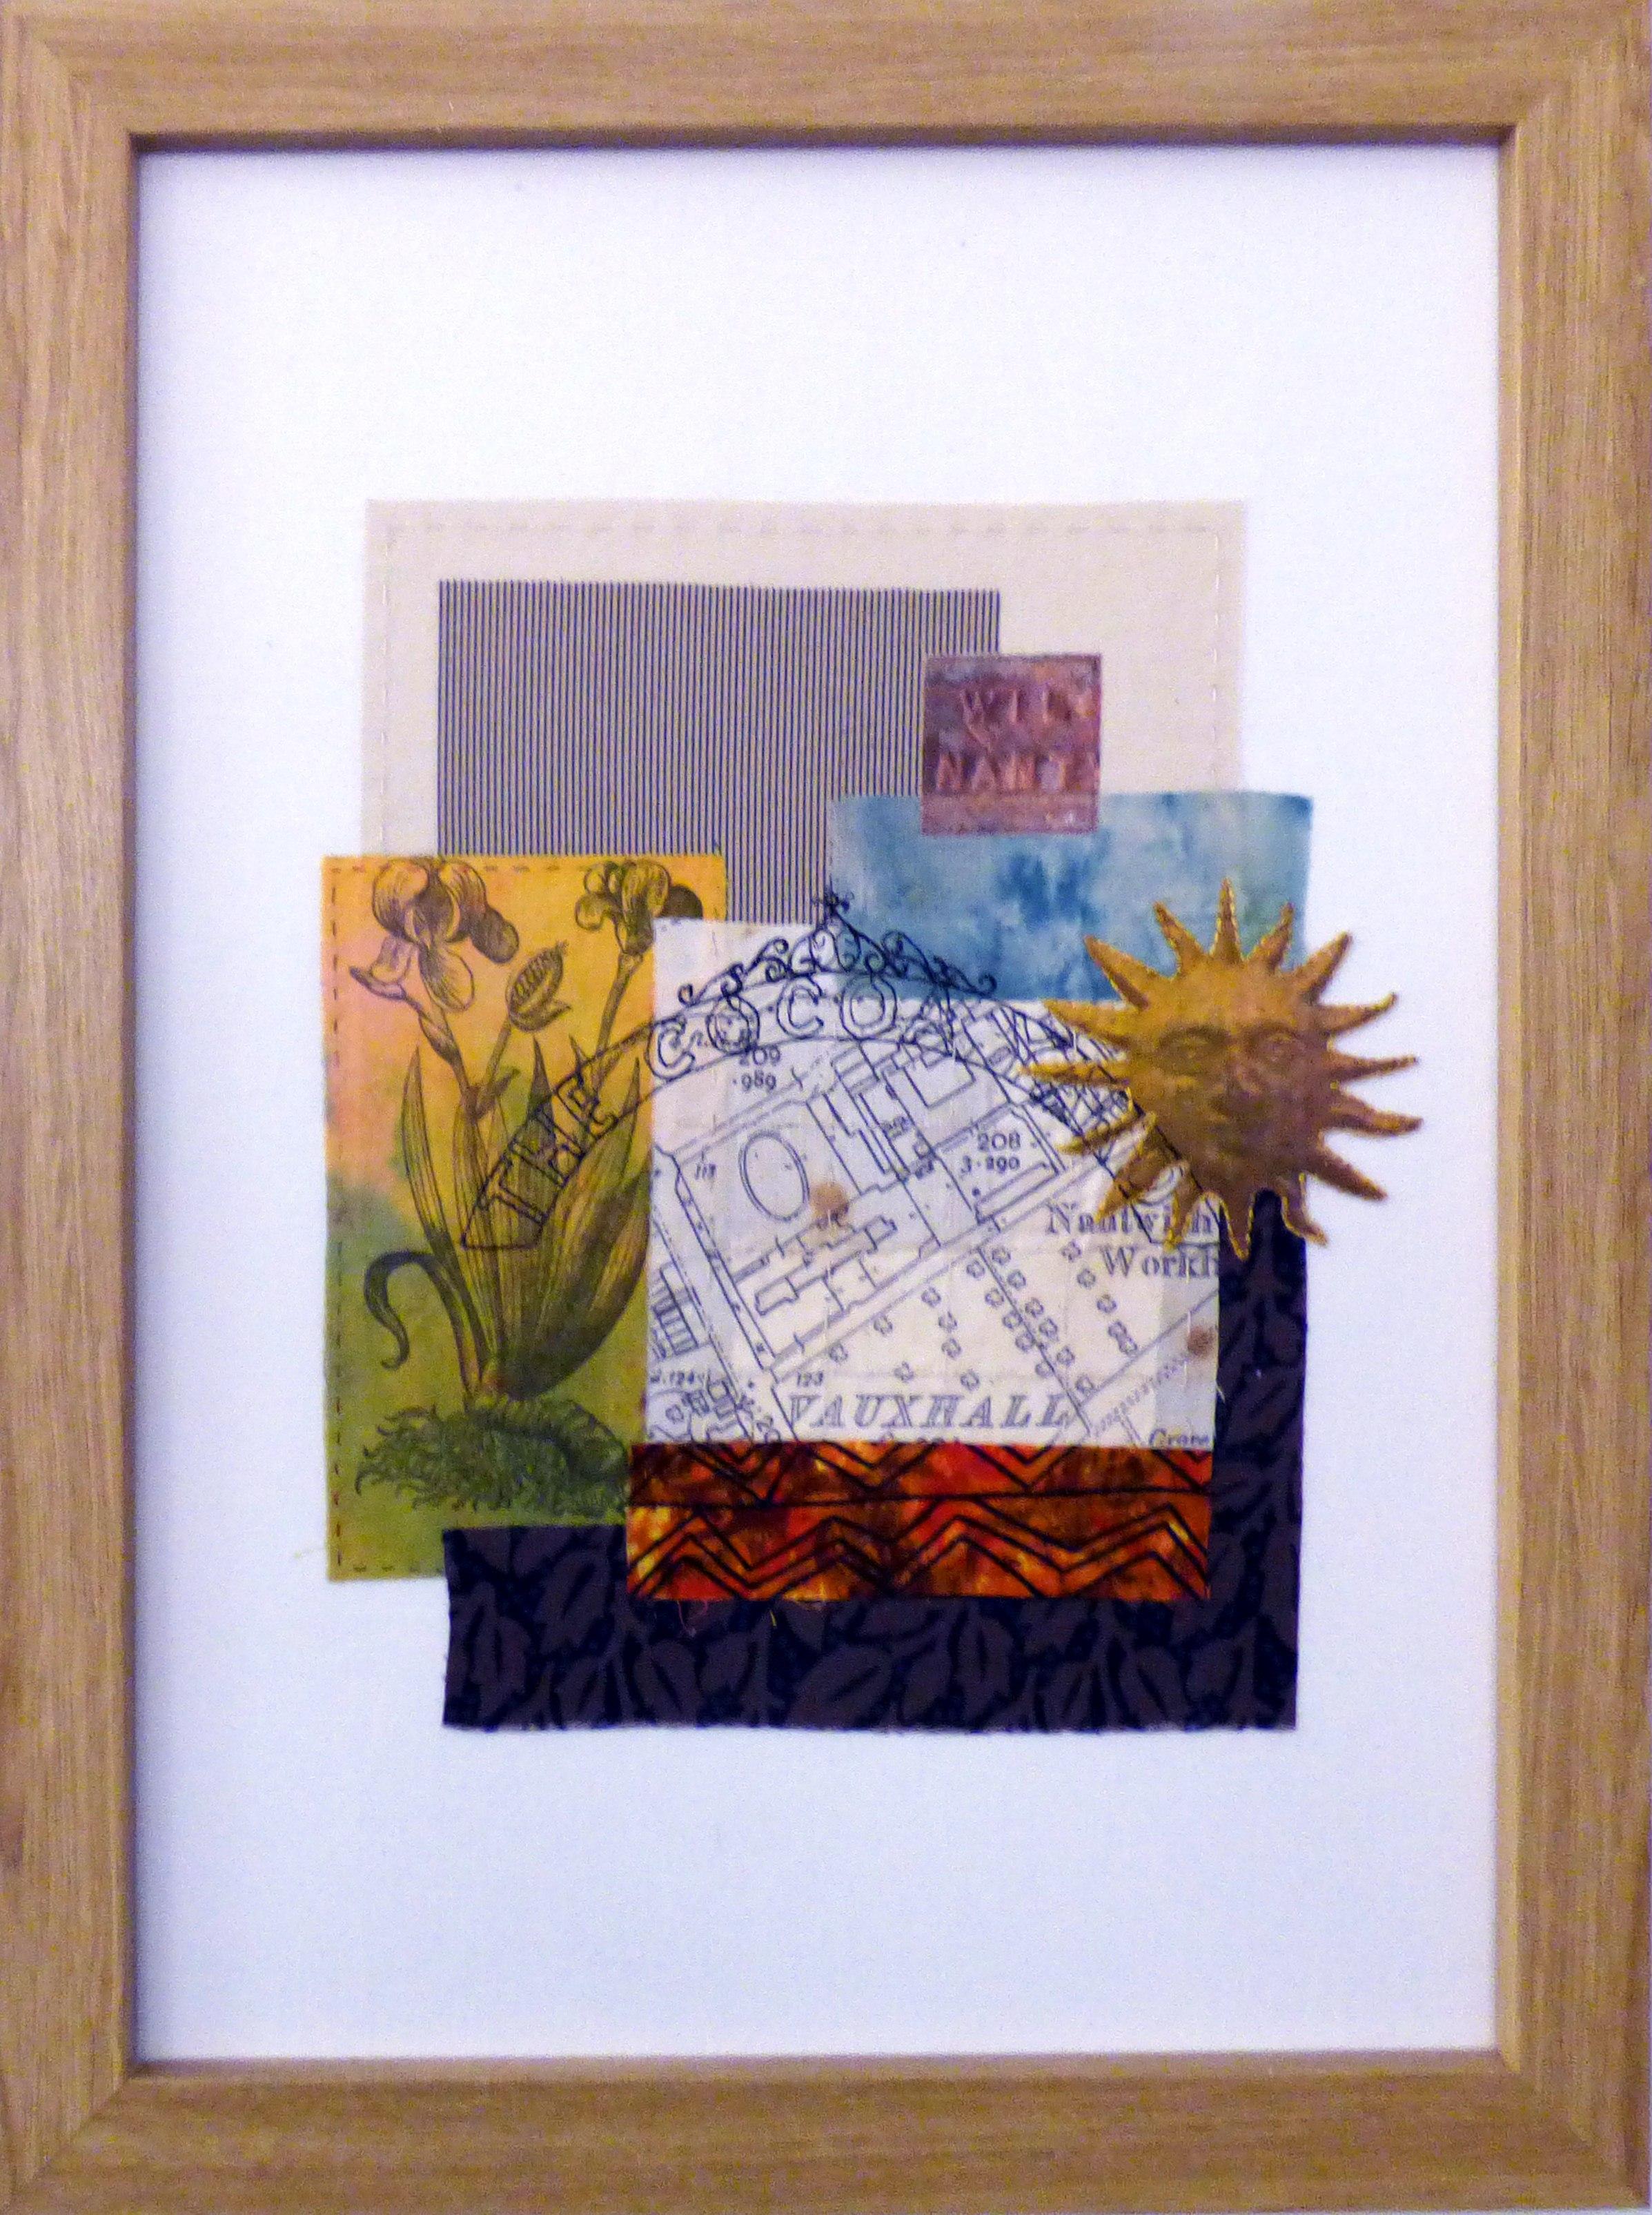 REFLECTIONS OF THE PAST 2 by Linda Bilsborrow, Ten Plus exhibition, Nantwich